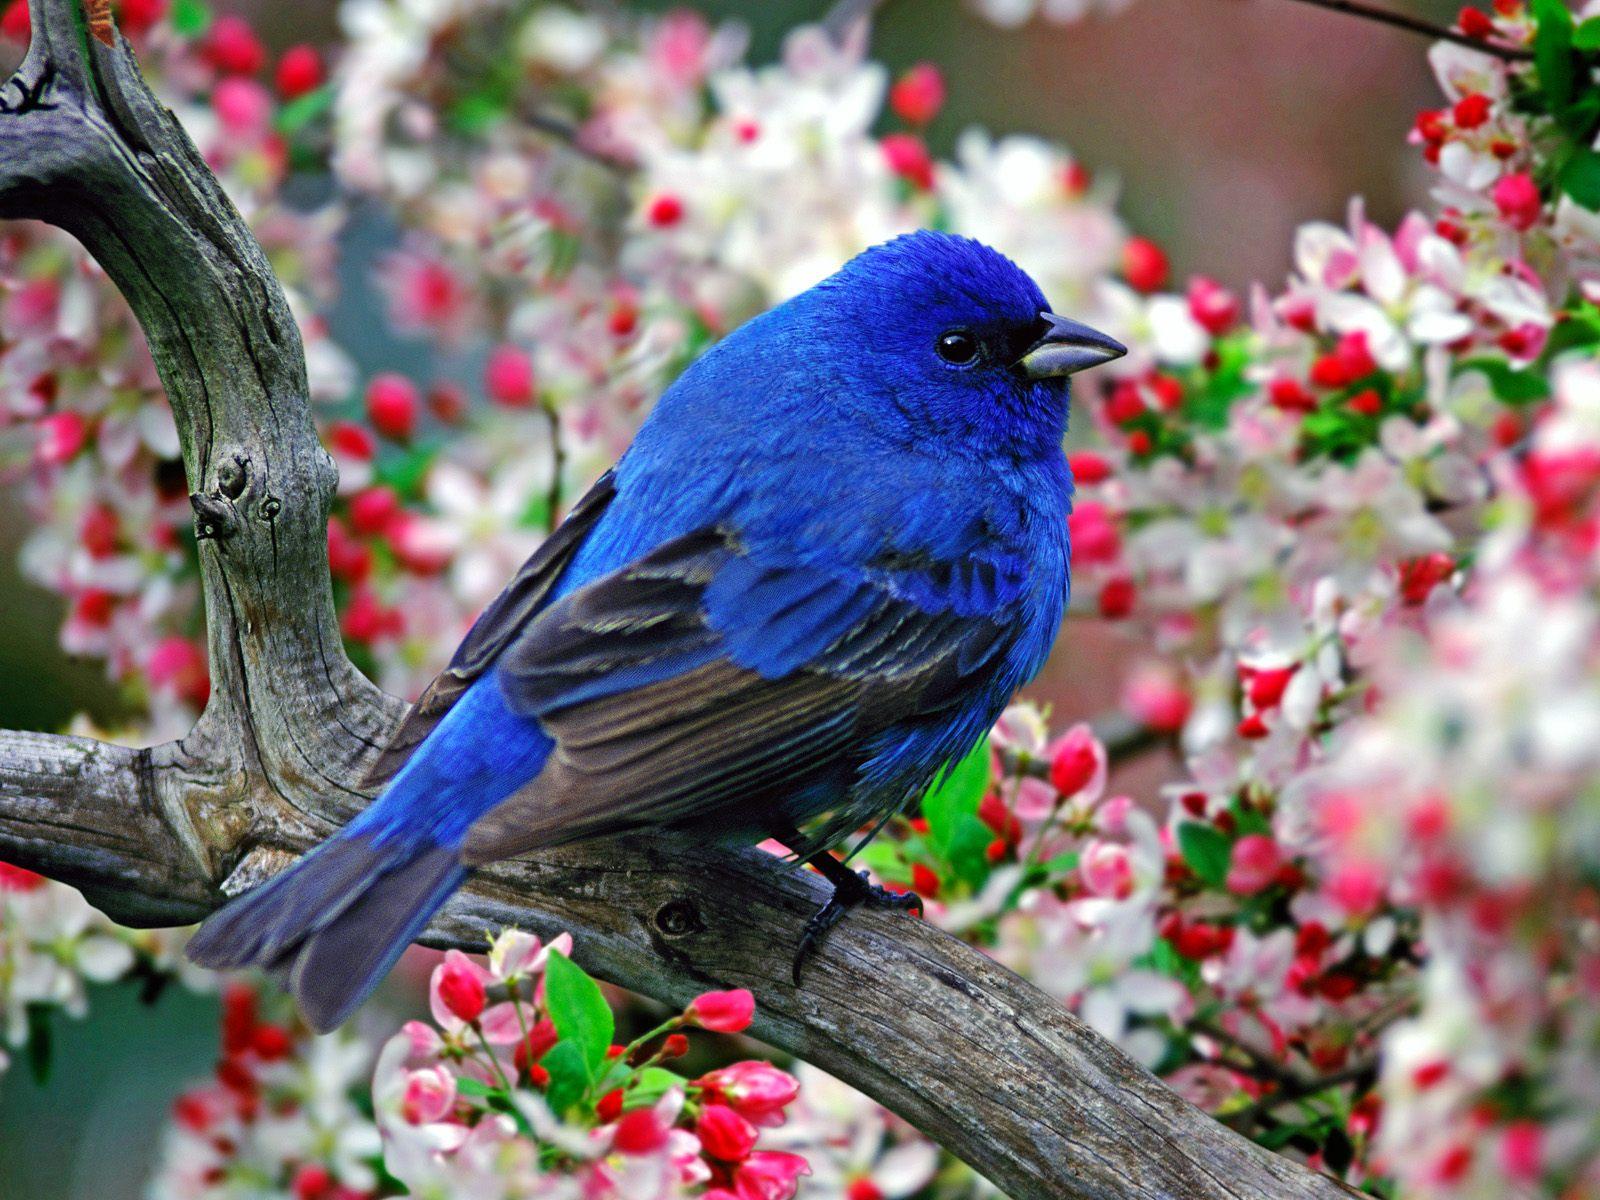 Bird Pictures Amazing Birds: Unique Wallpaper: Colourful Birds